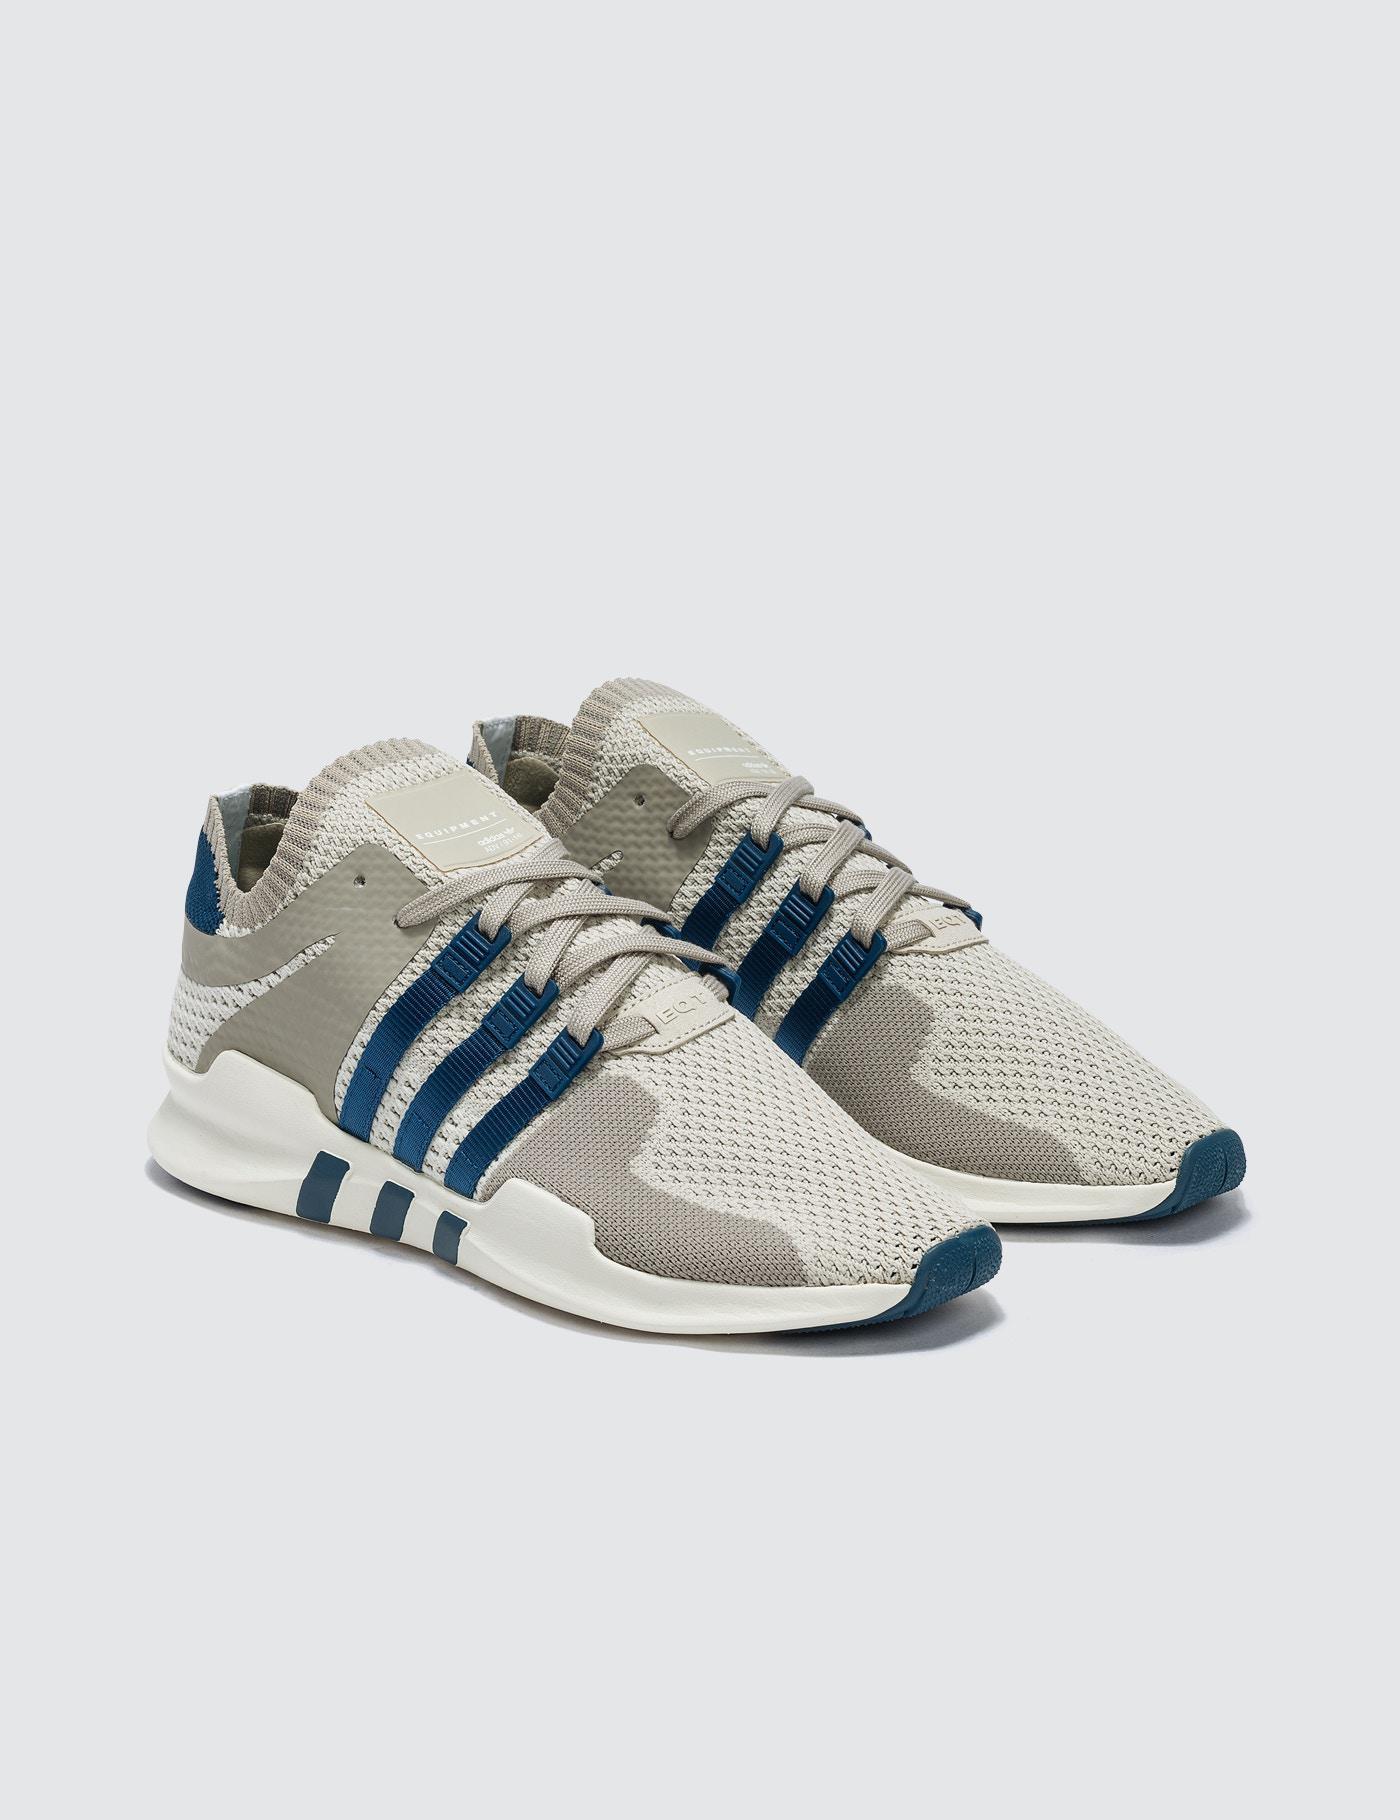 Lyst Adidas Originals Eqt Support Adv Primeknit In Blue For Men